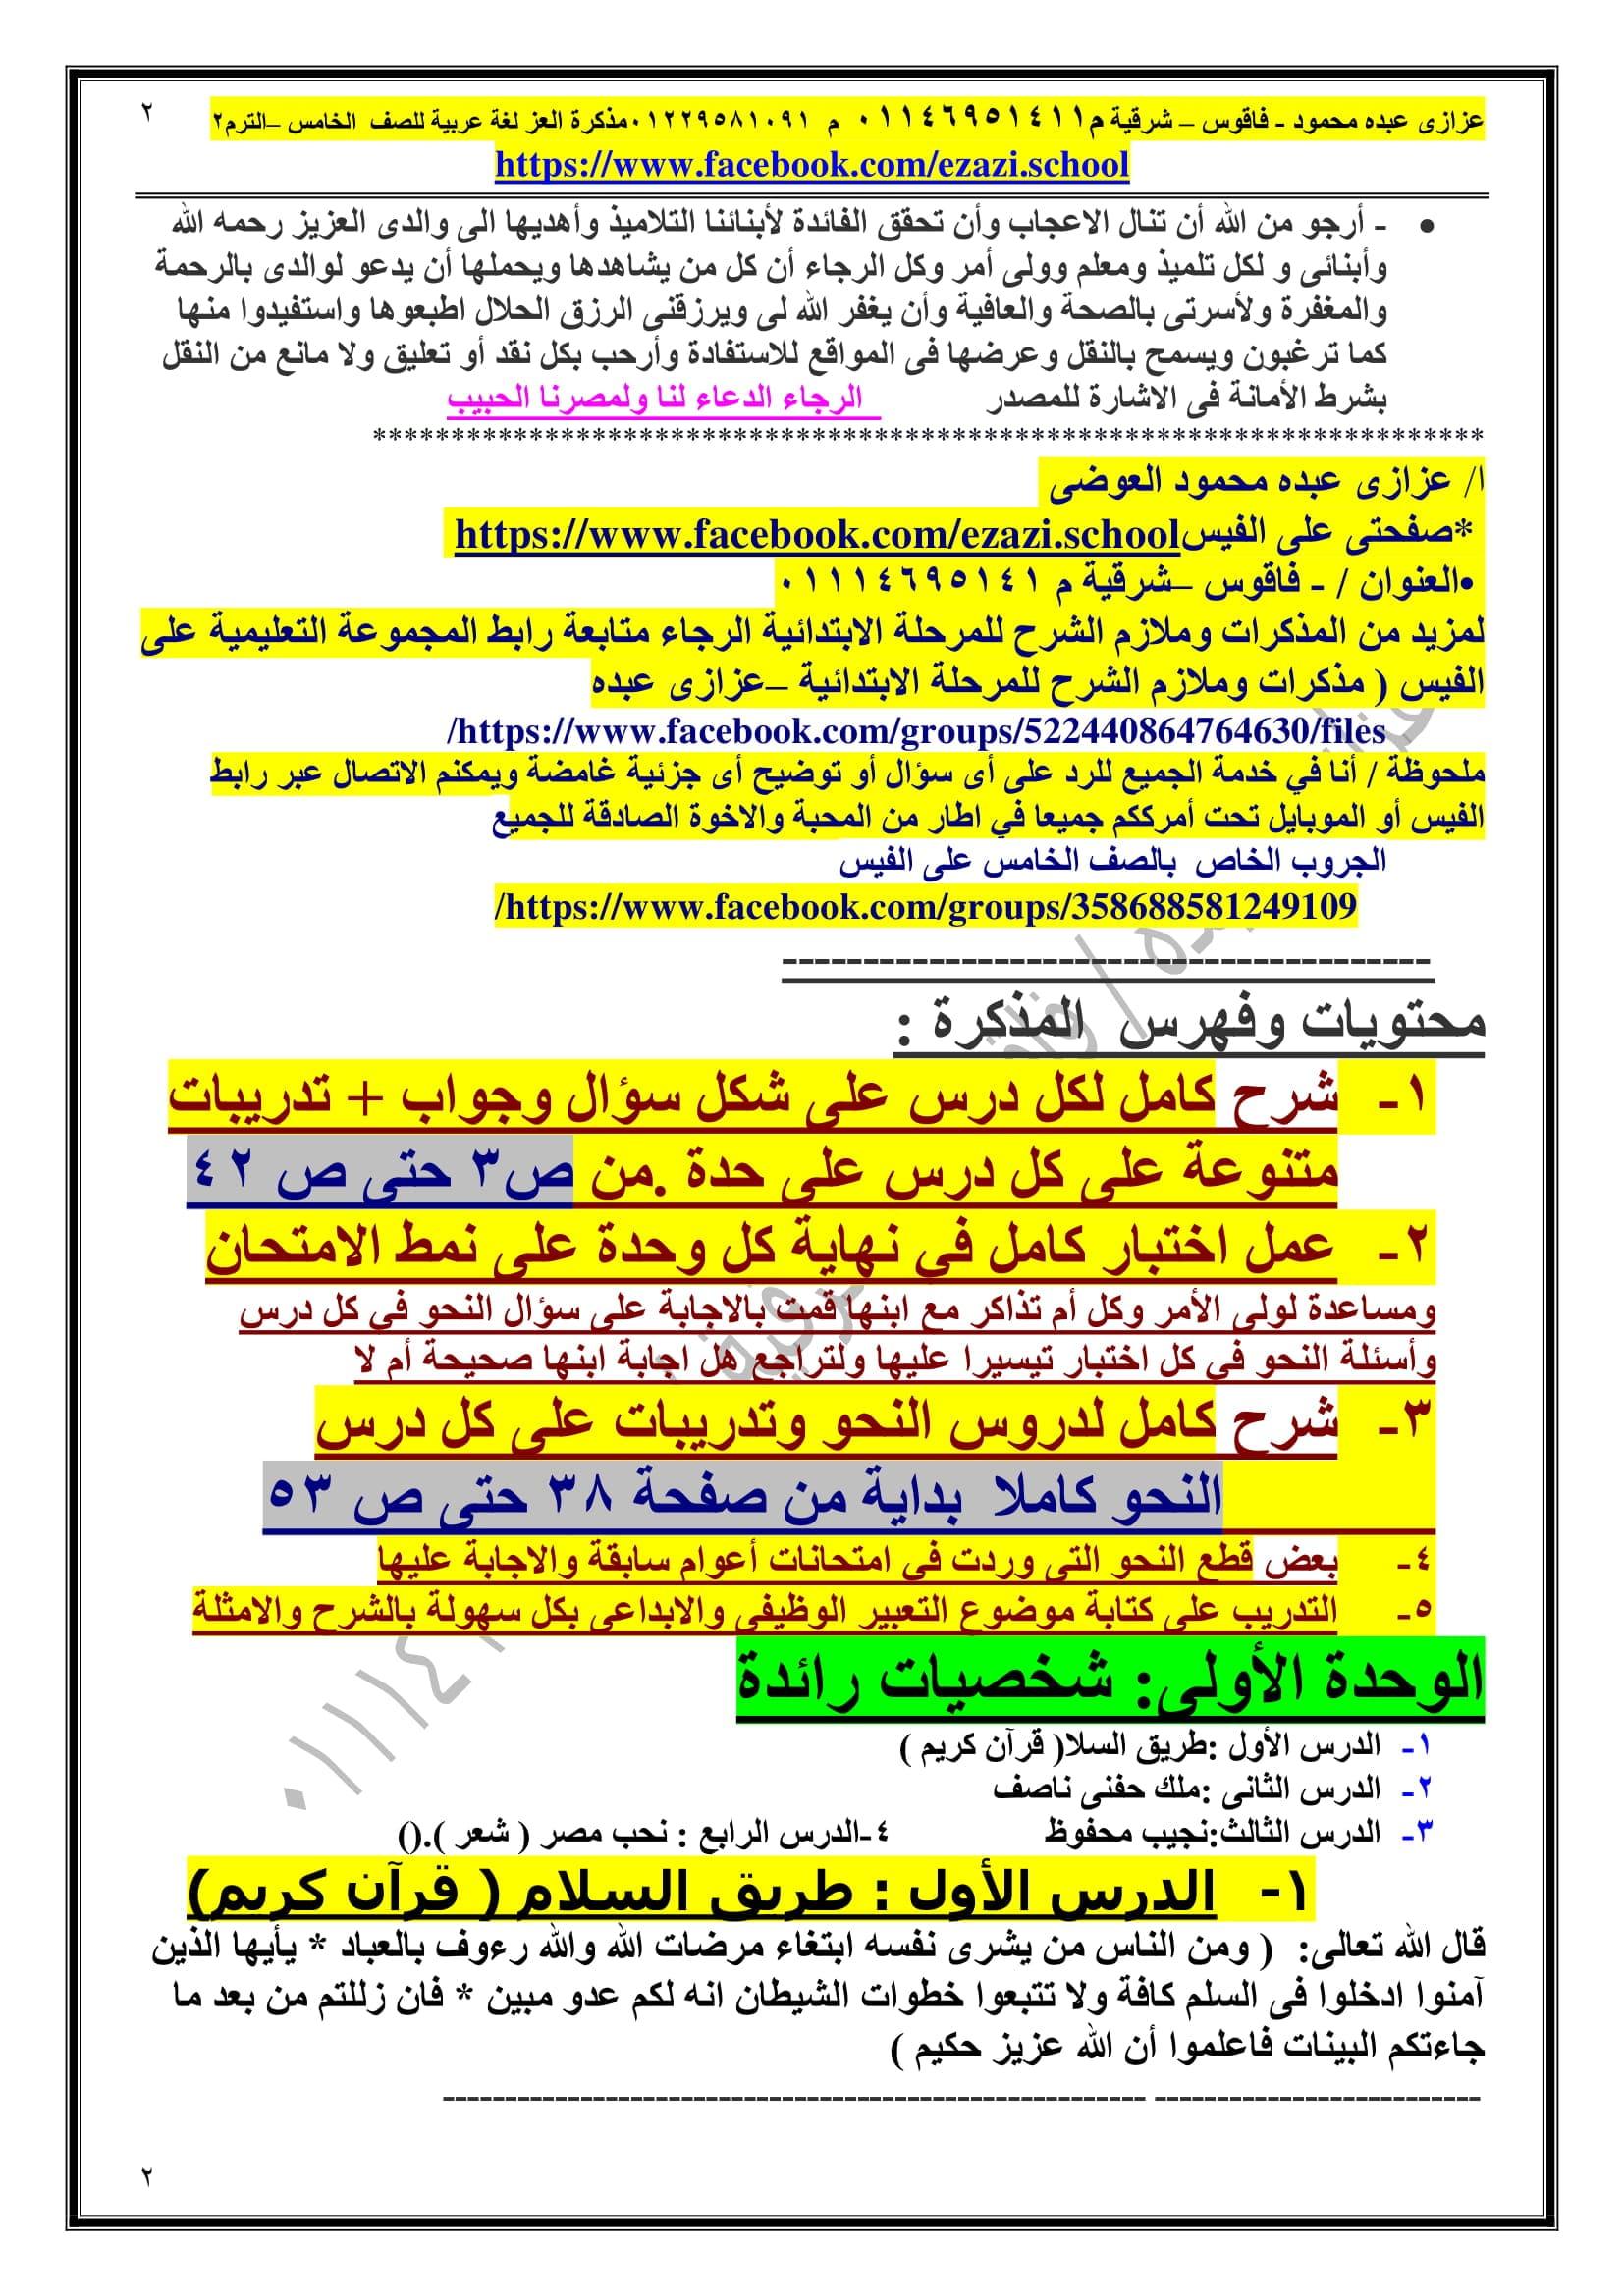 exam-eg.com_152483487326811.jpg